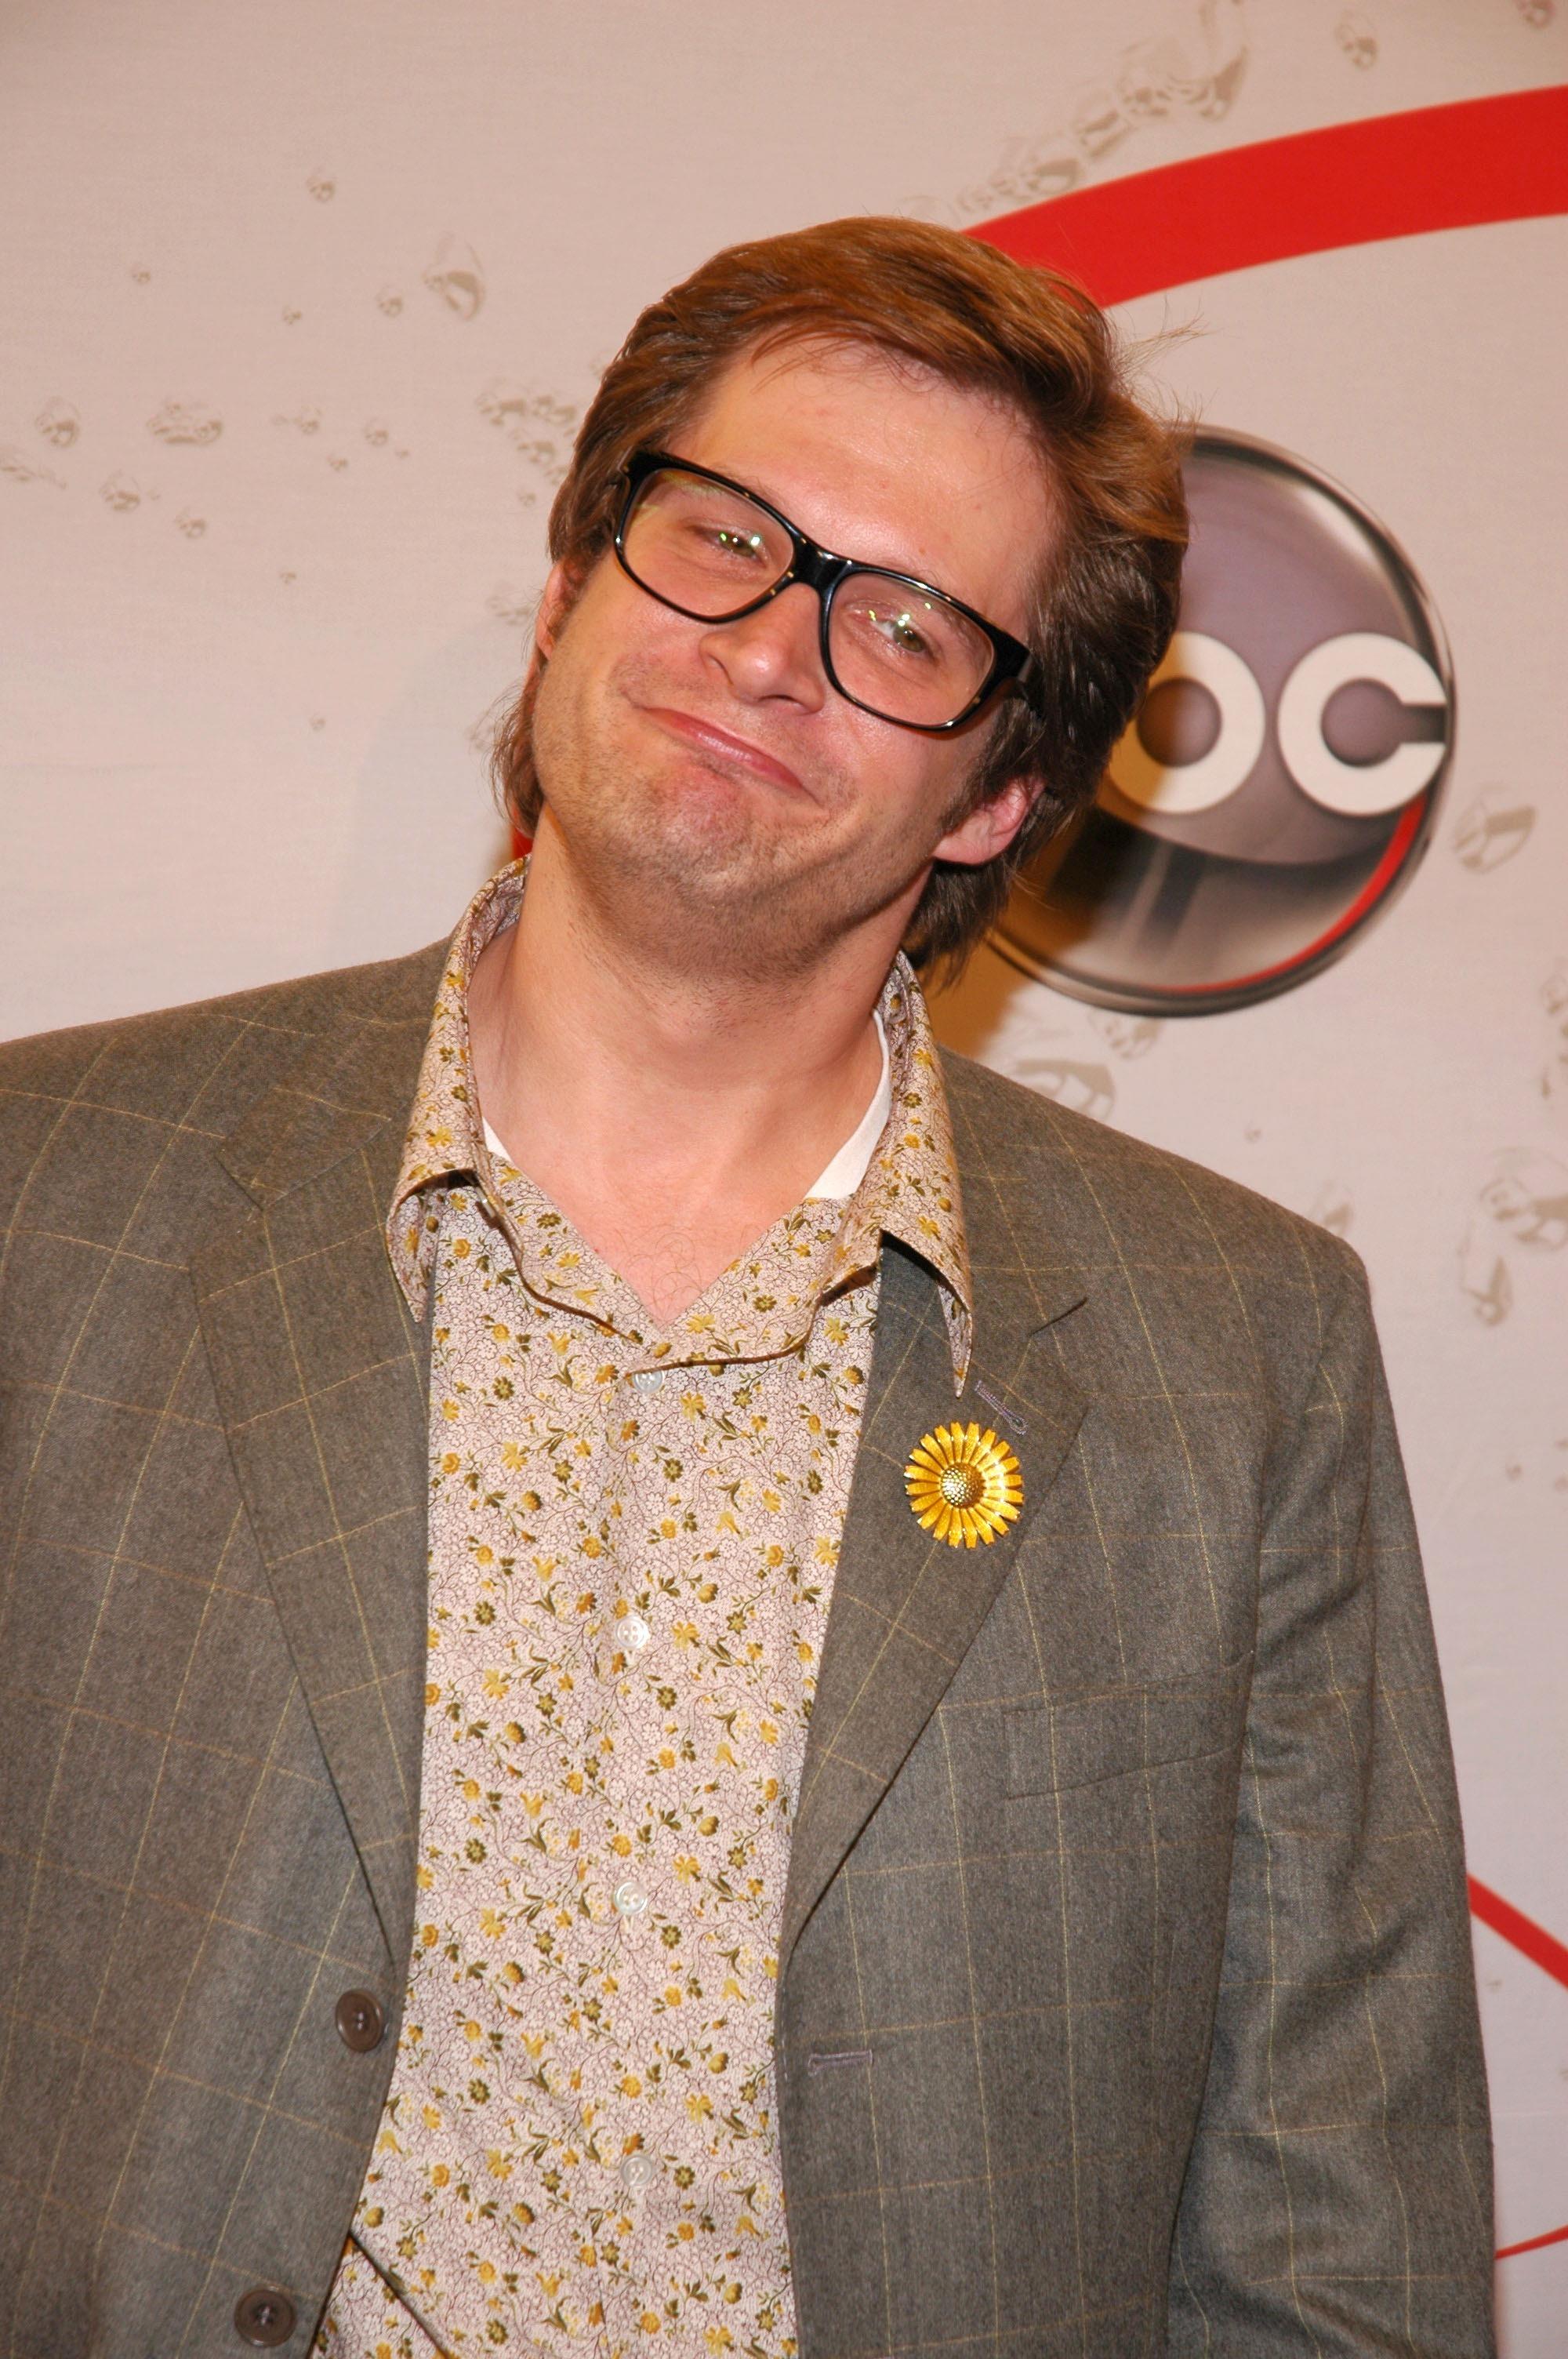 Bryan fuller might be the internets favorite tv showrunner and steven henrygetty images entertainmentgetty images izmirmasajfo